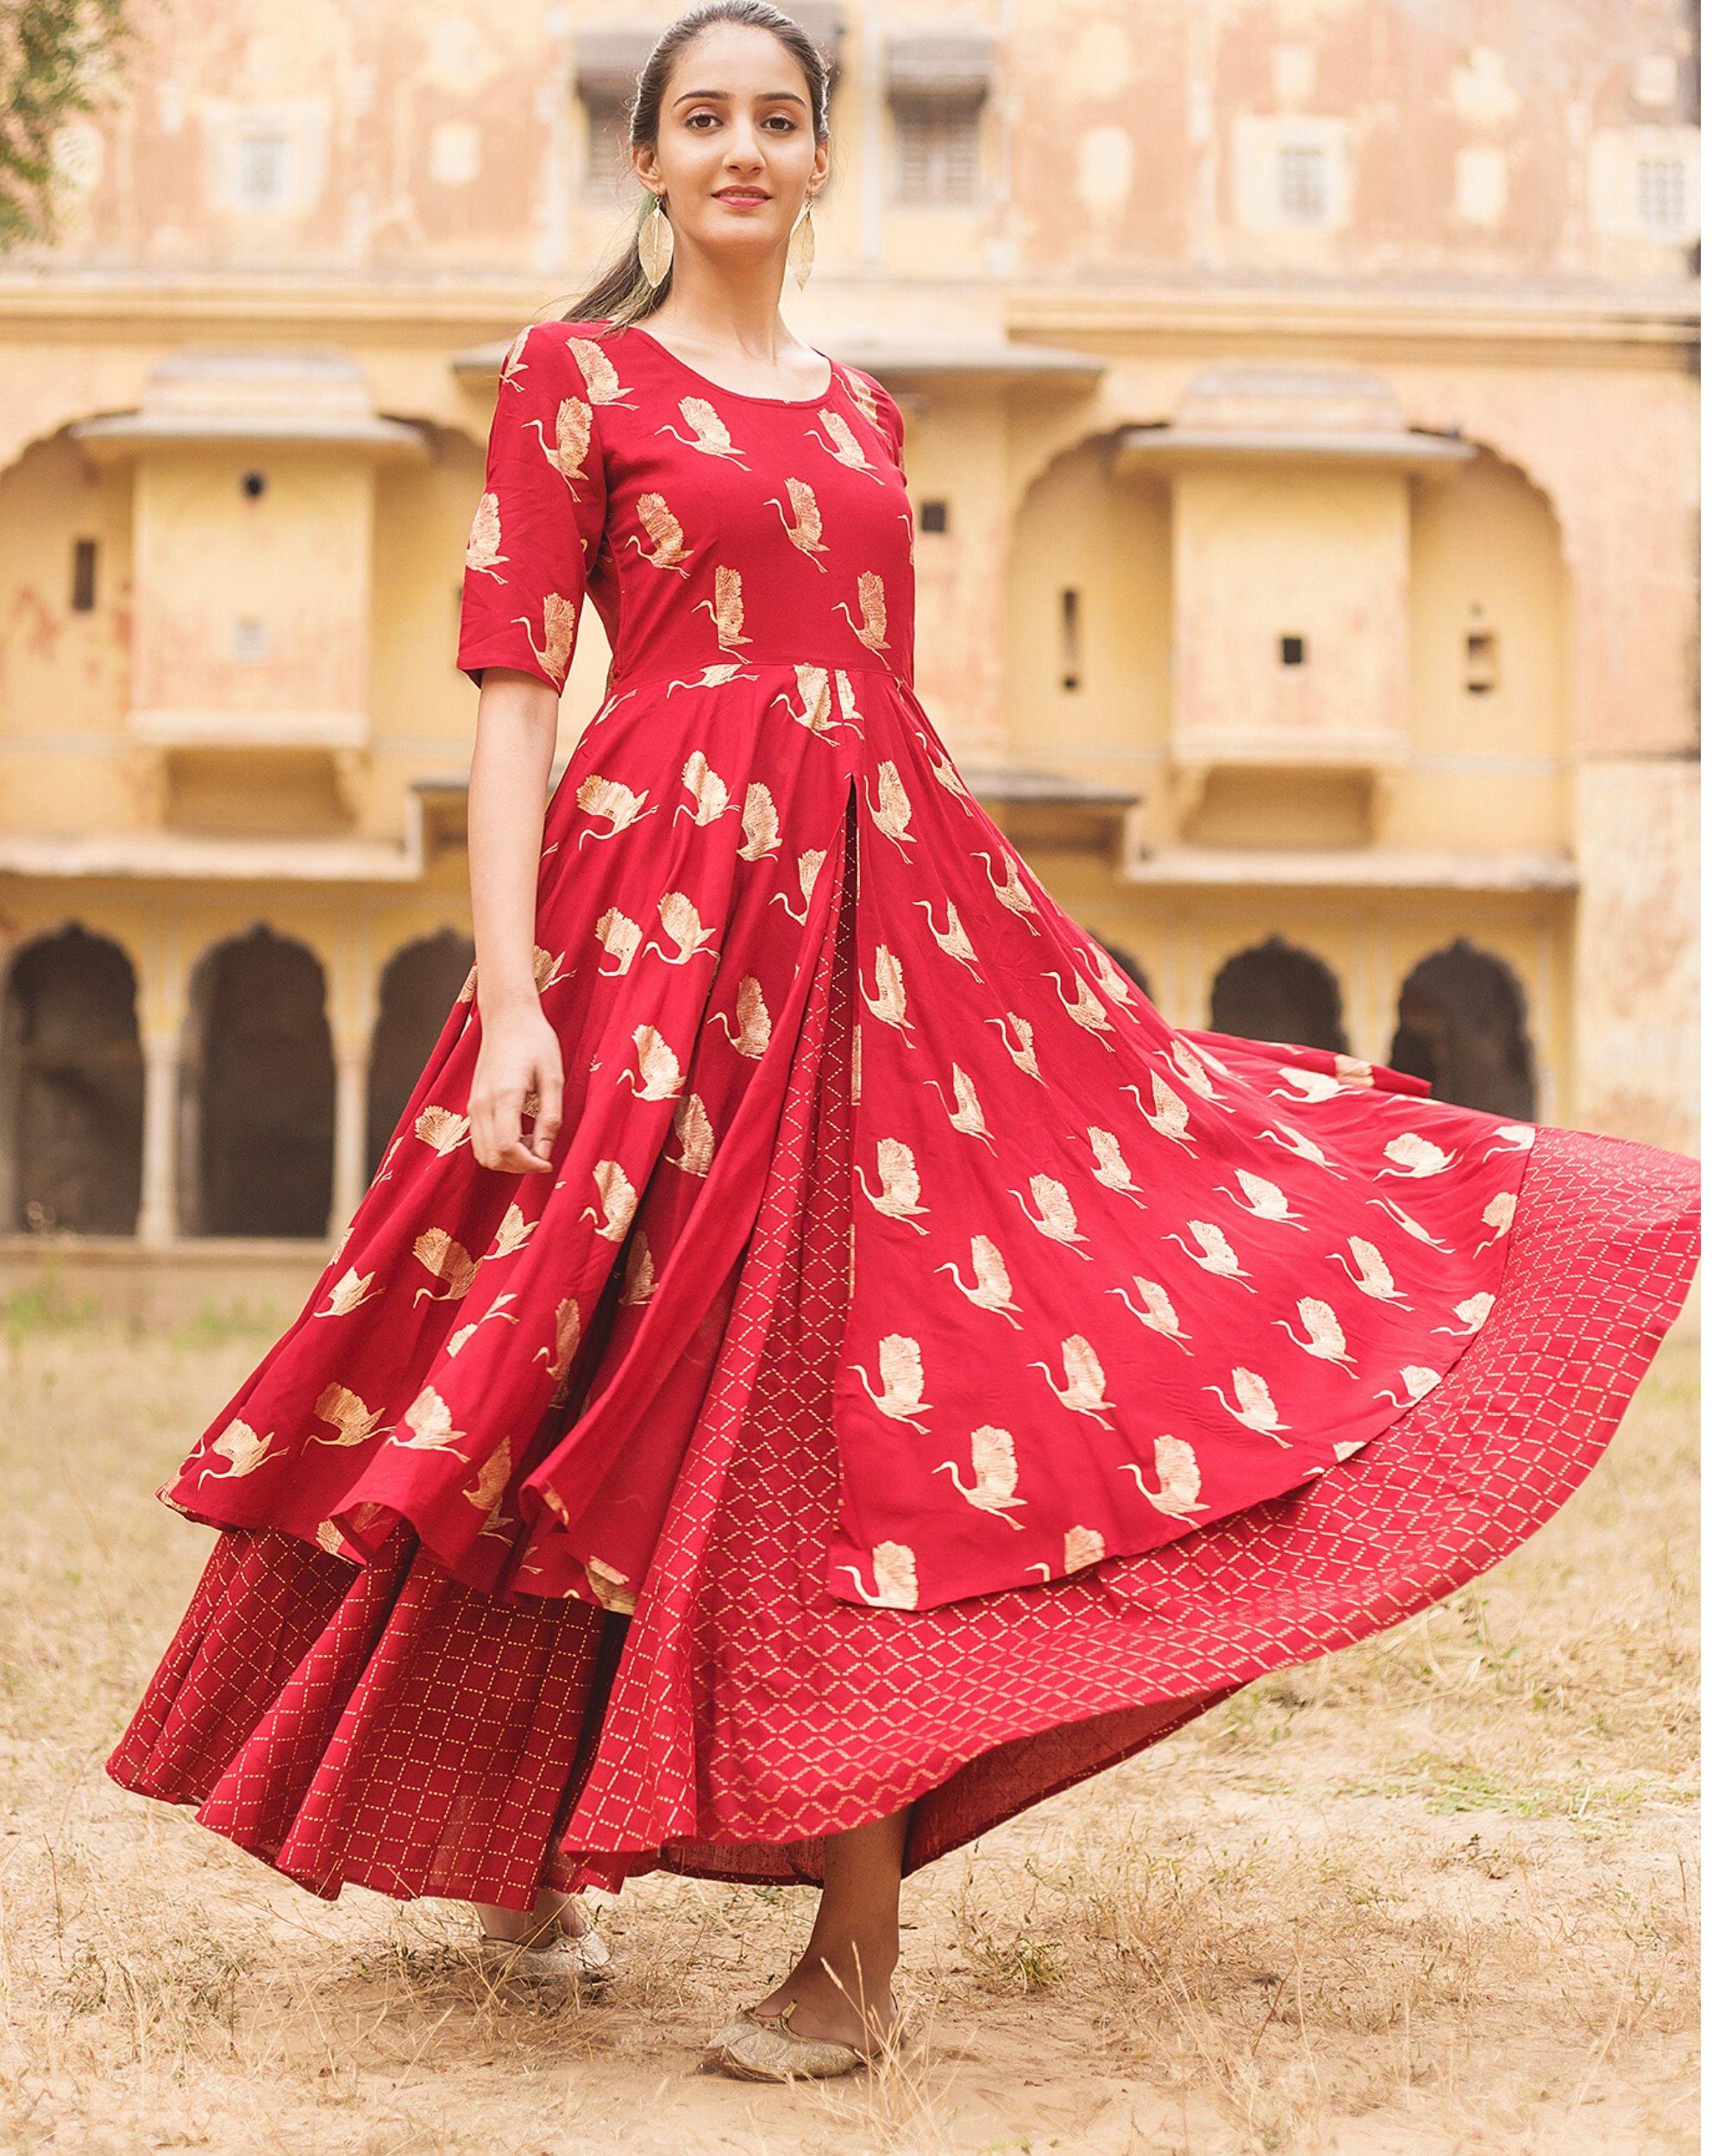 Red flamingo layered dress